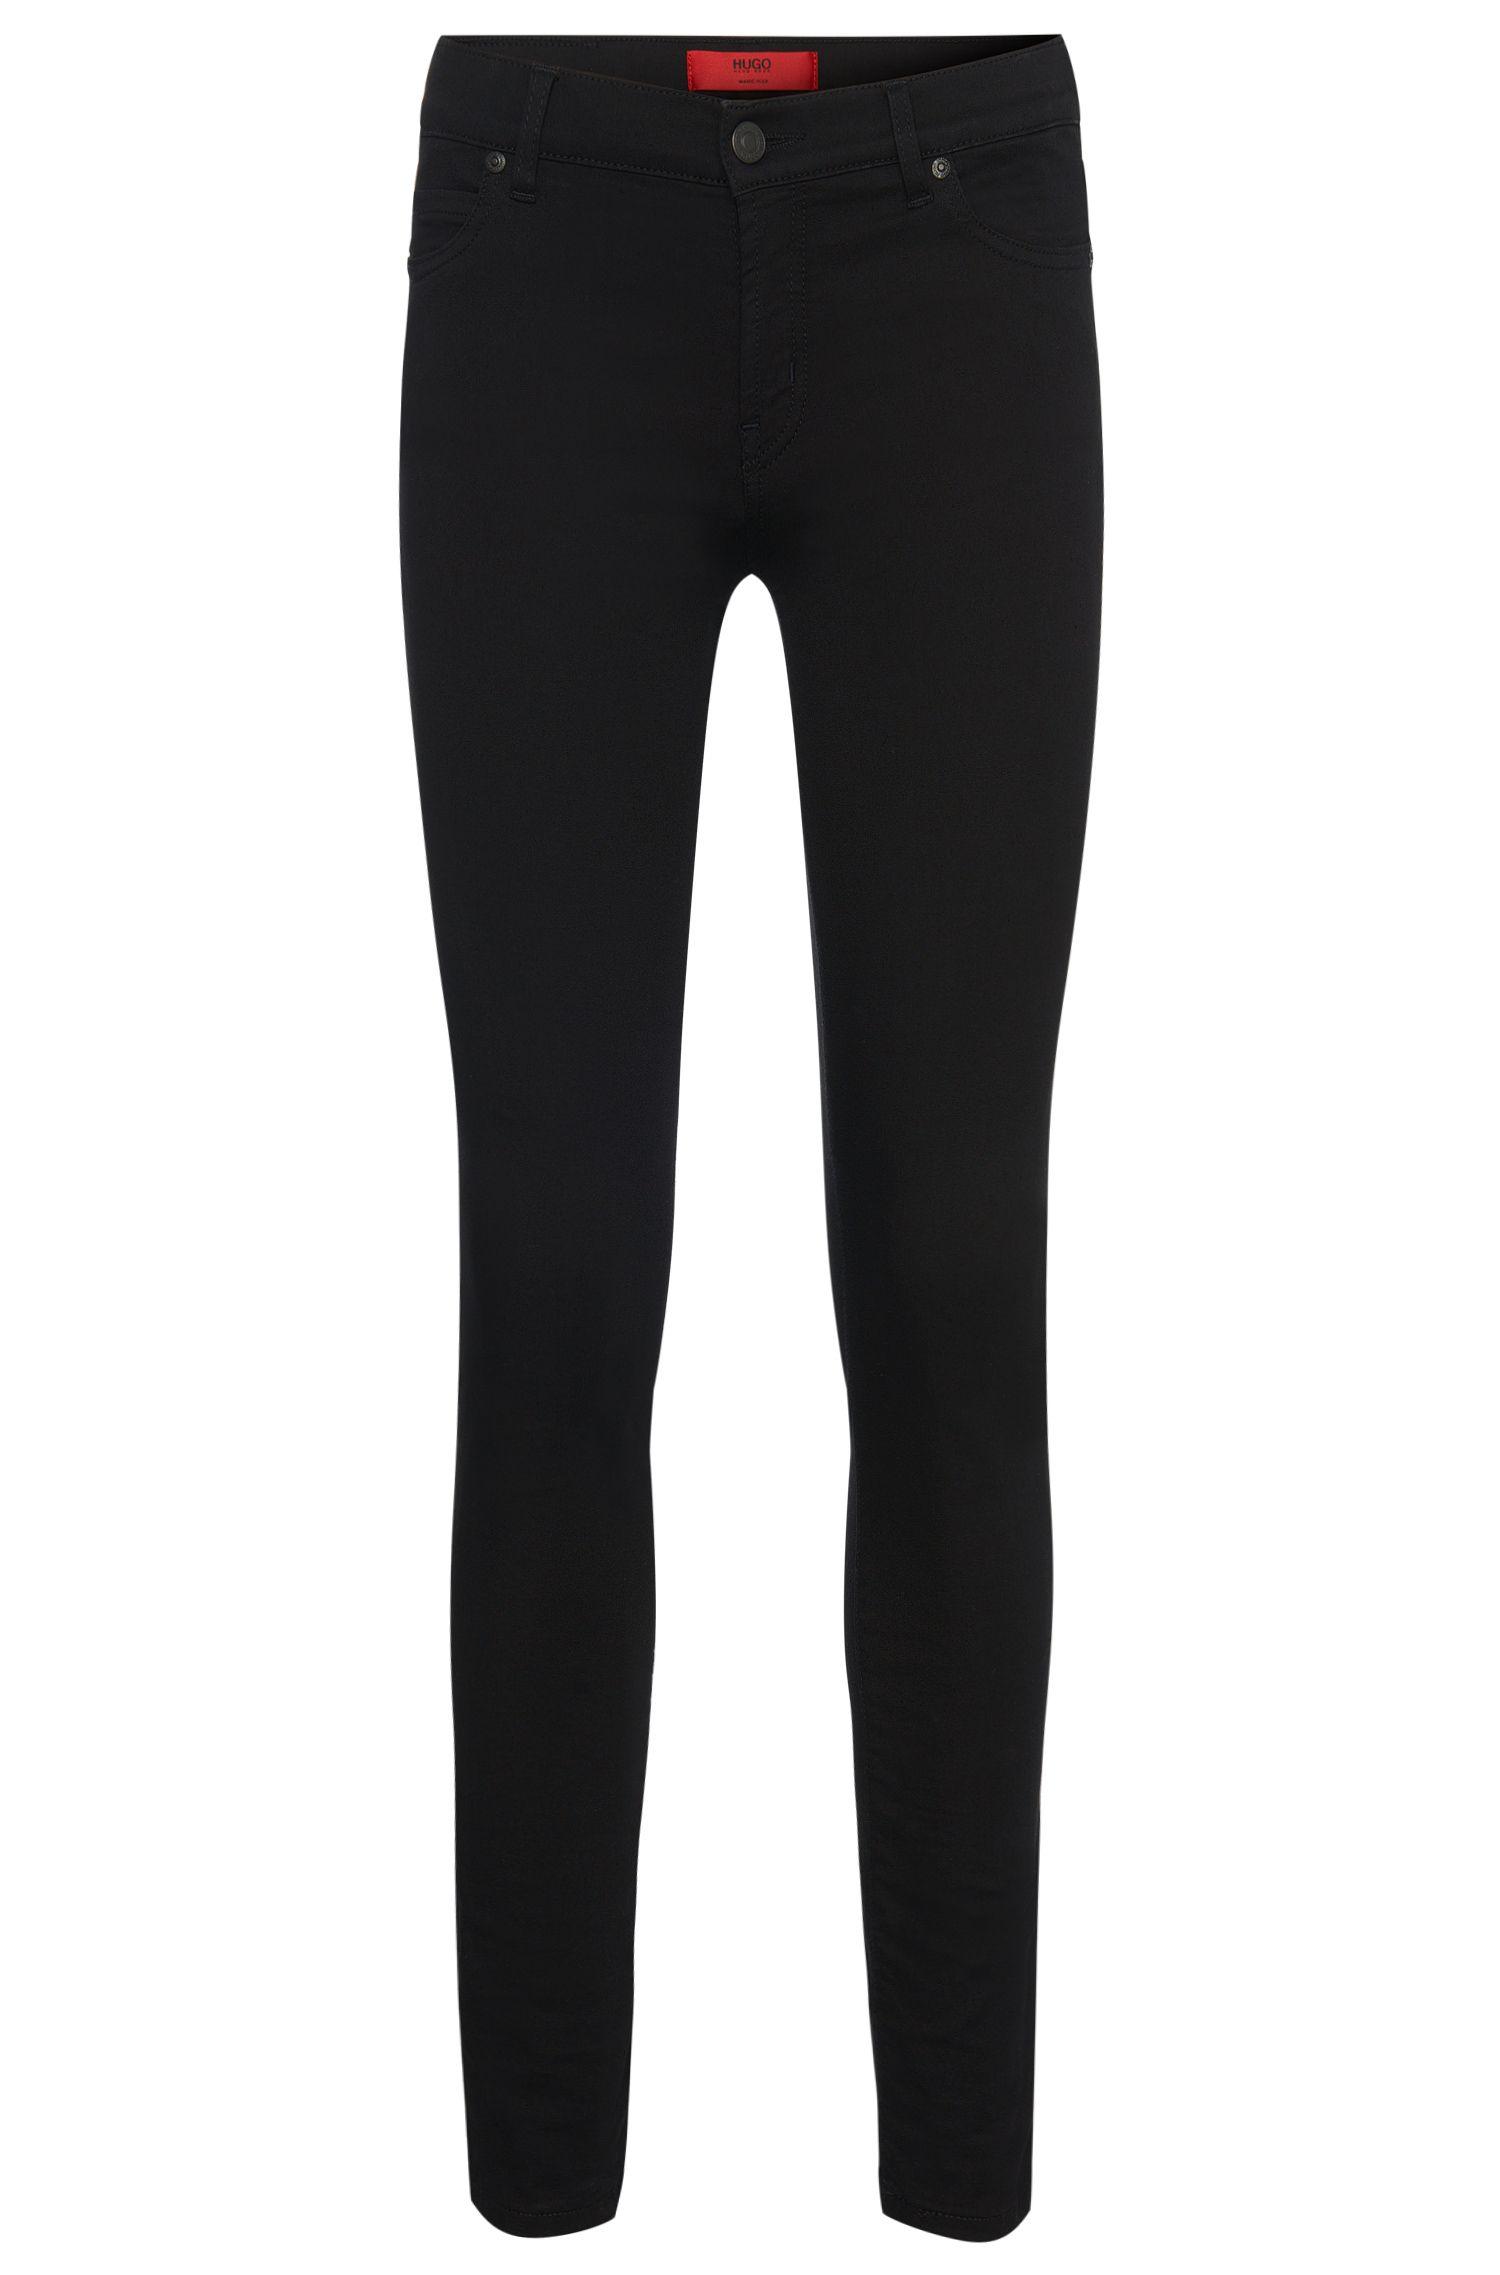 'Georgina'   Stretch Cotton Blend Mid-Rise Jeans